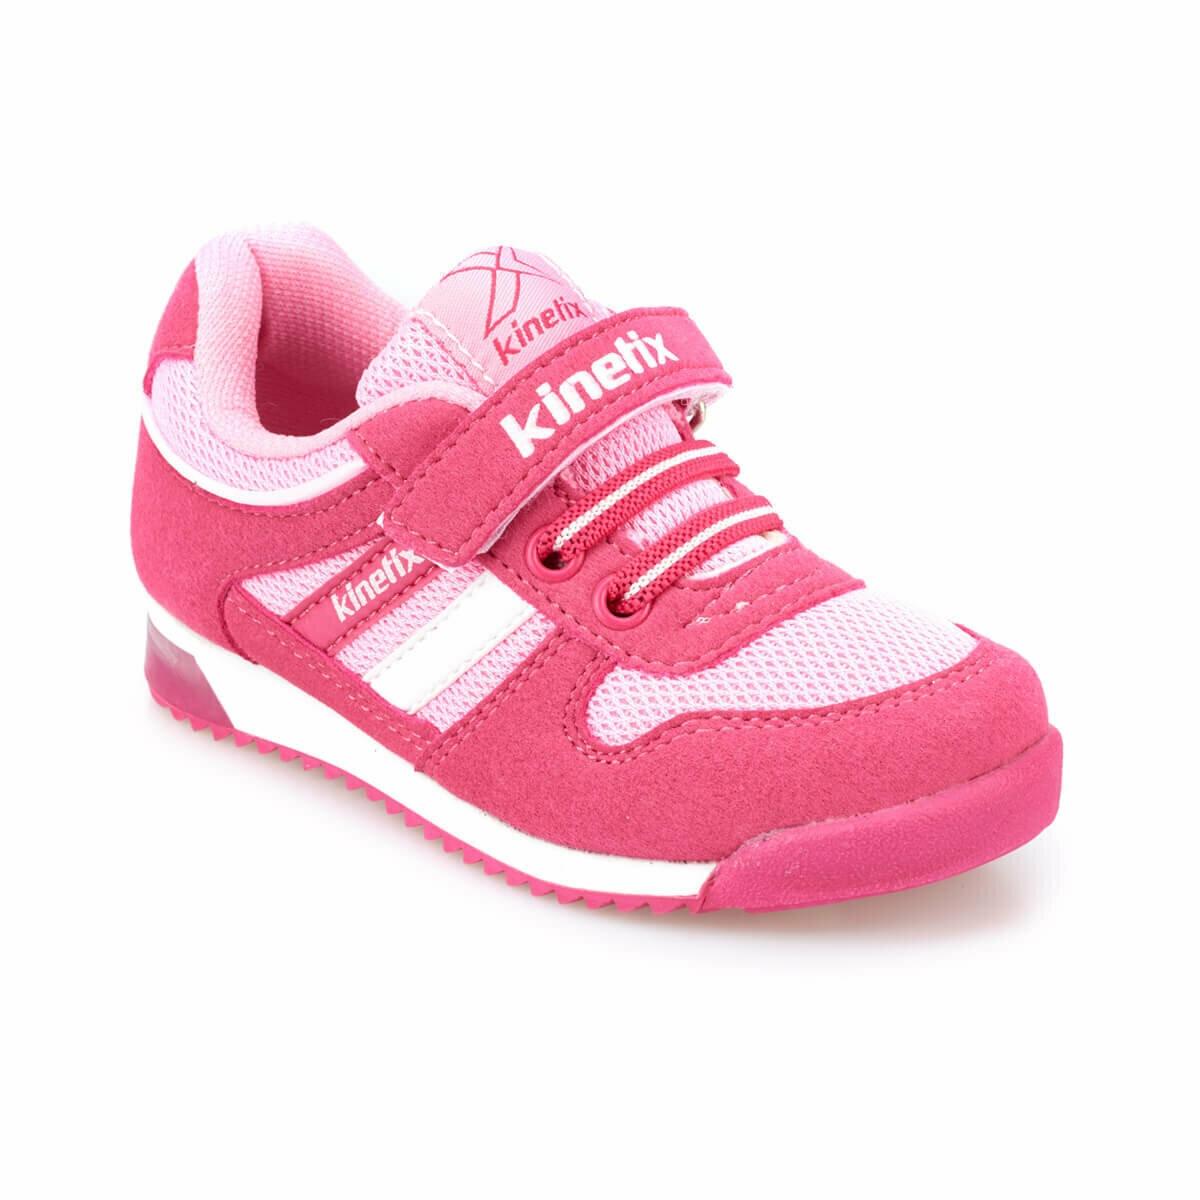 FLO FEMAND fucsia mujer zapatilla deportiva para niños zapatos KINETIX